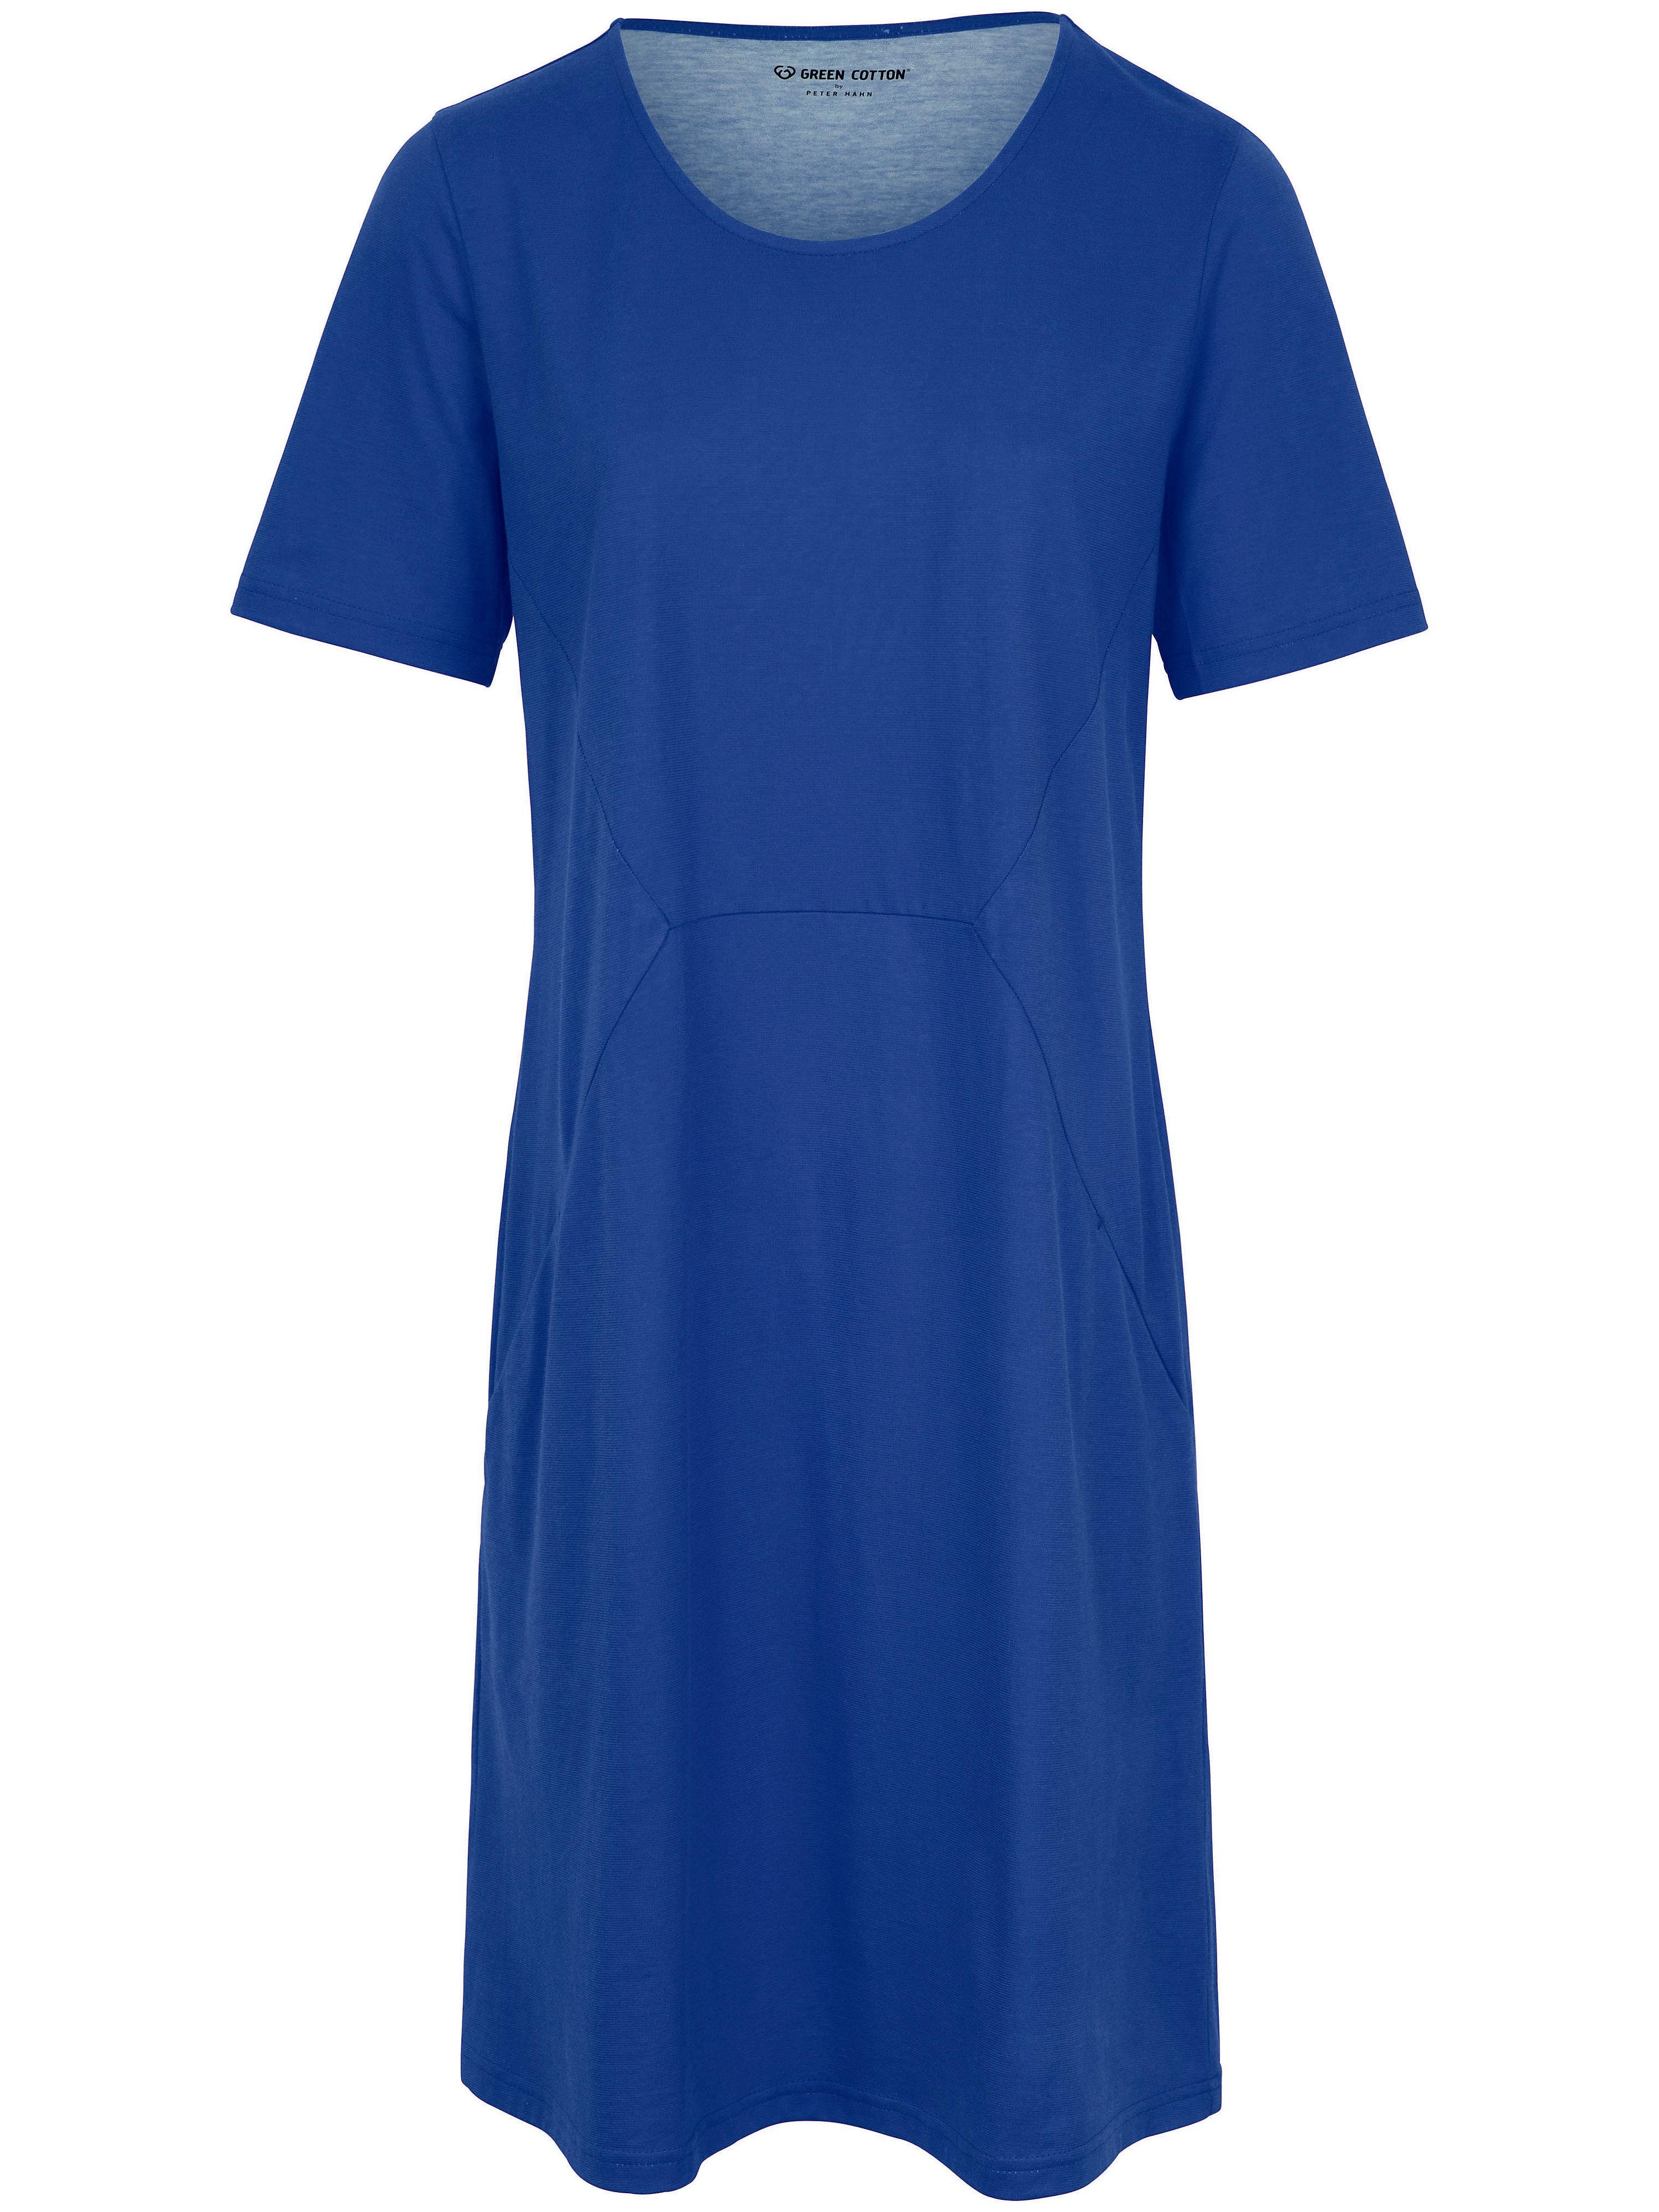 La robe jersey, manches courtes  Green Cotton bleu taille 40